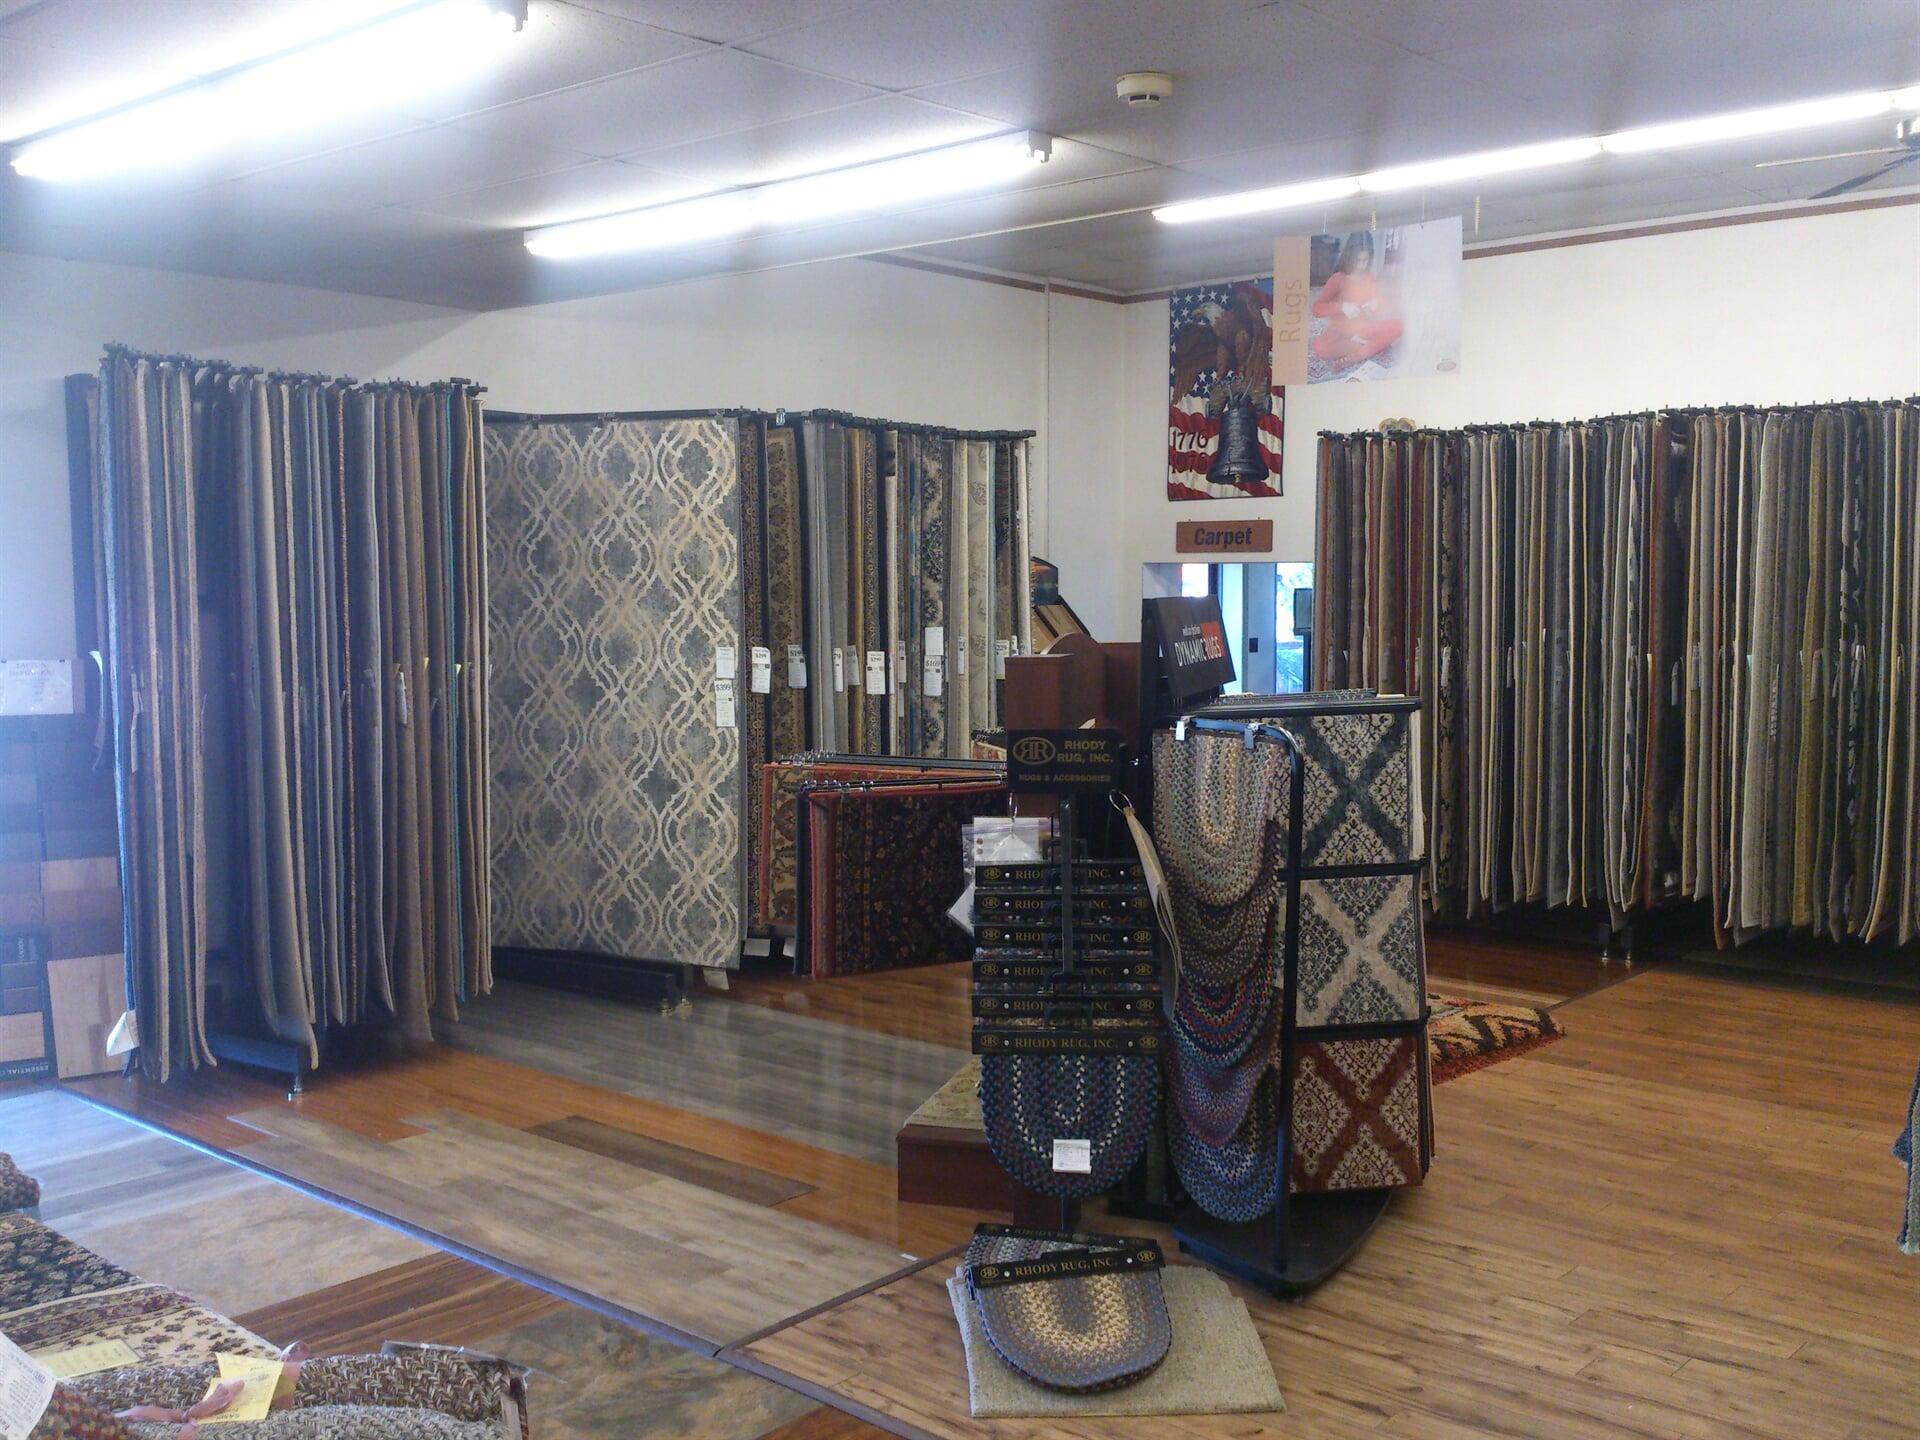 CHARLES F. ZEIGLER SONS showroom near Gettysburg, PA